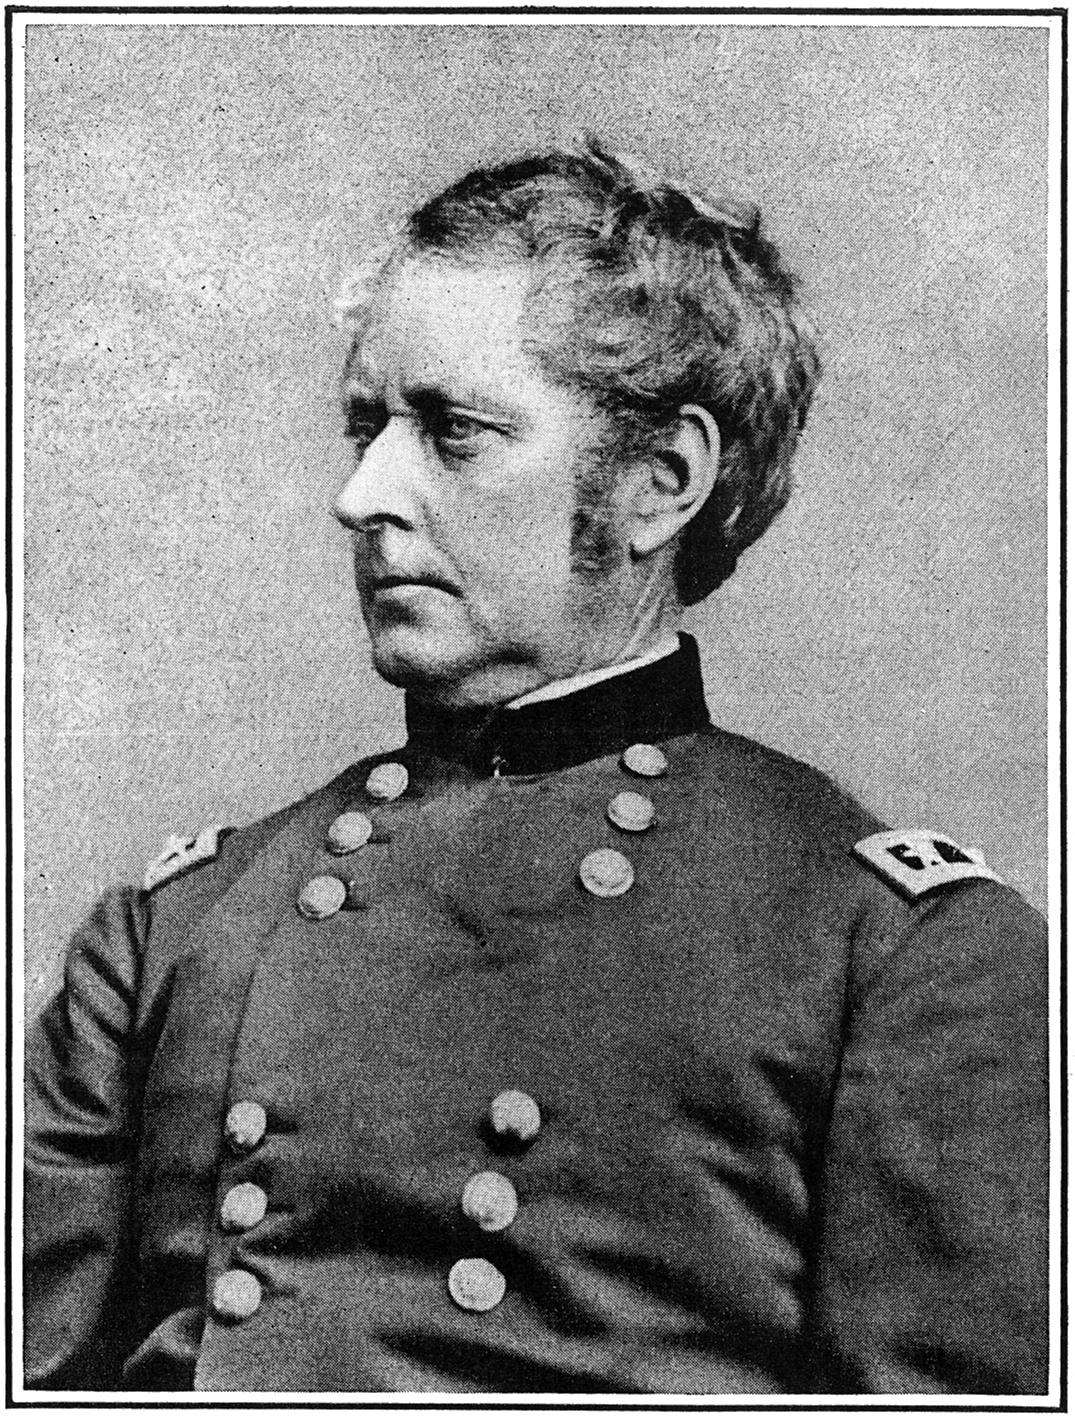 General_Joseph_Hooker.png